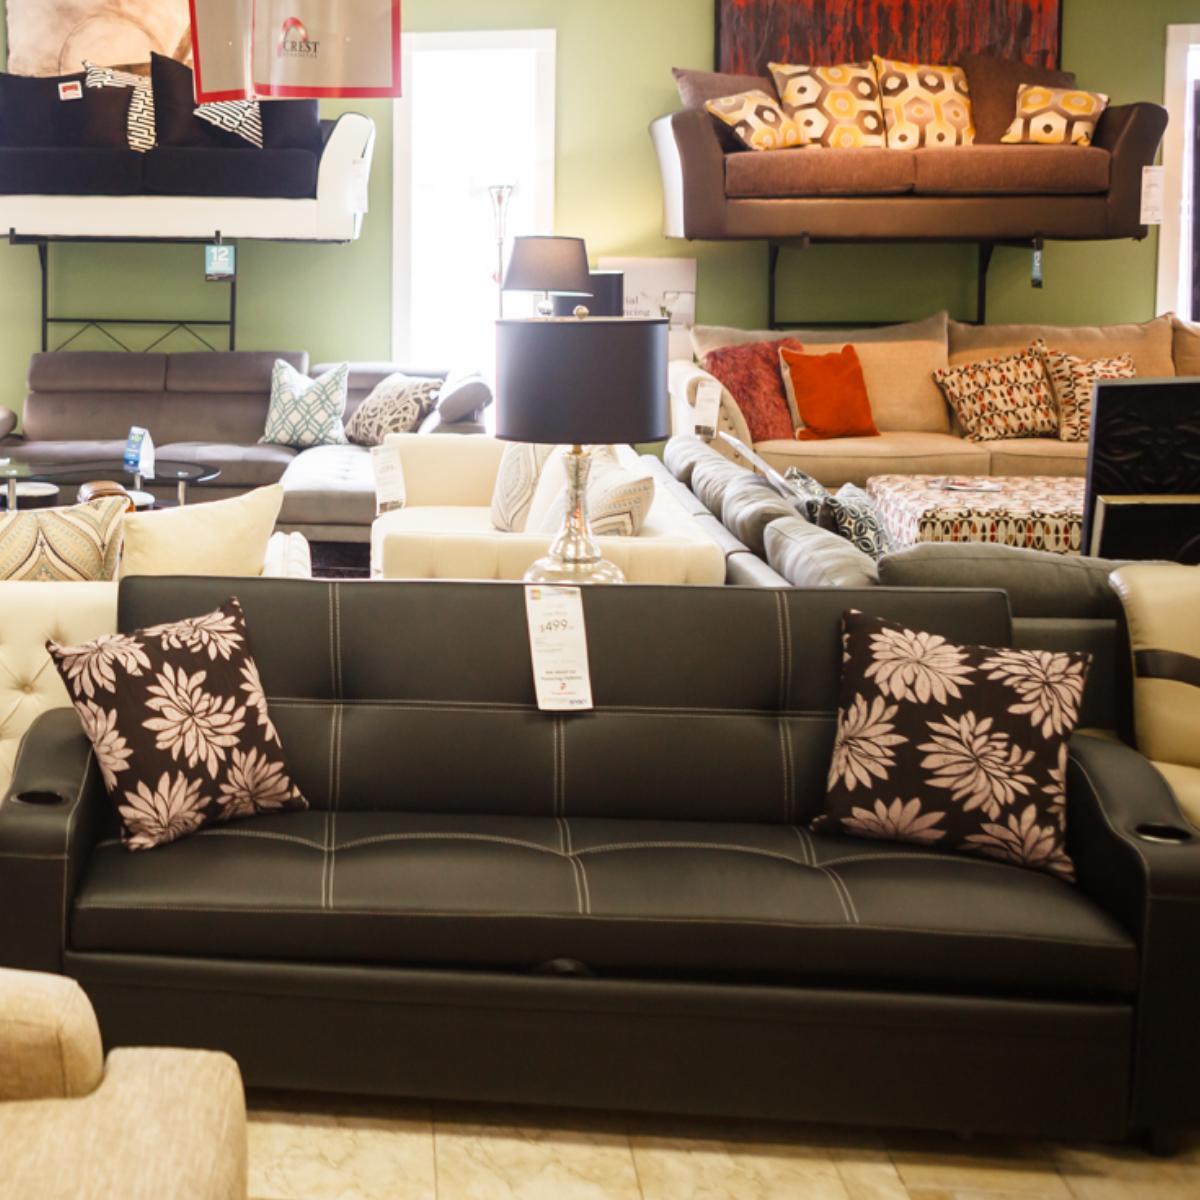 Designer Furniture 4 Less Followed